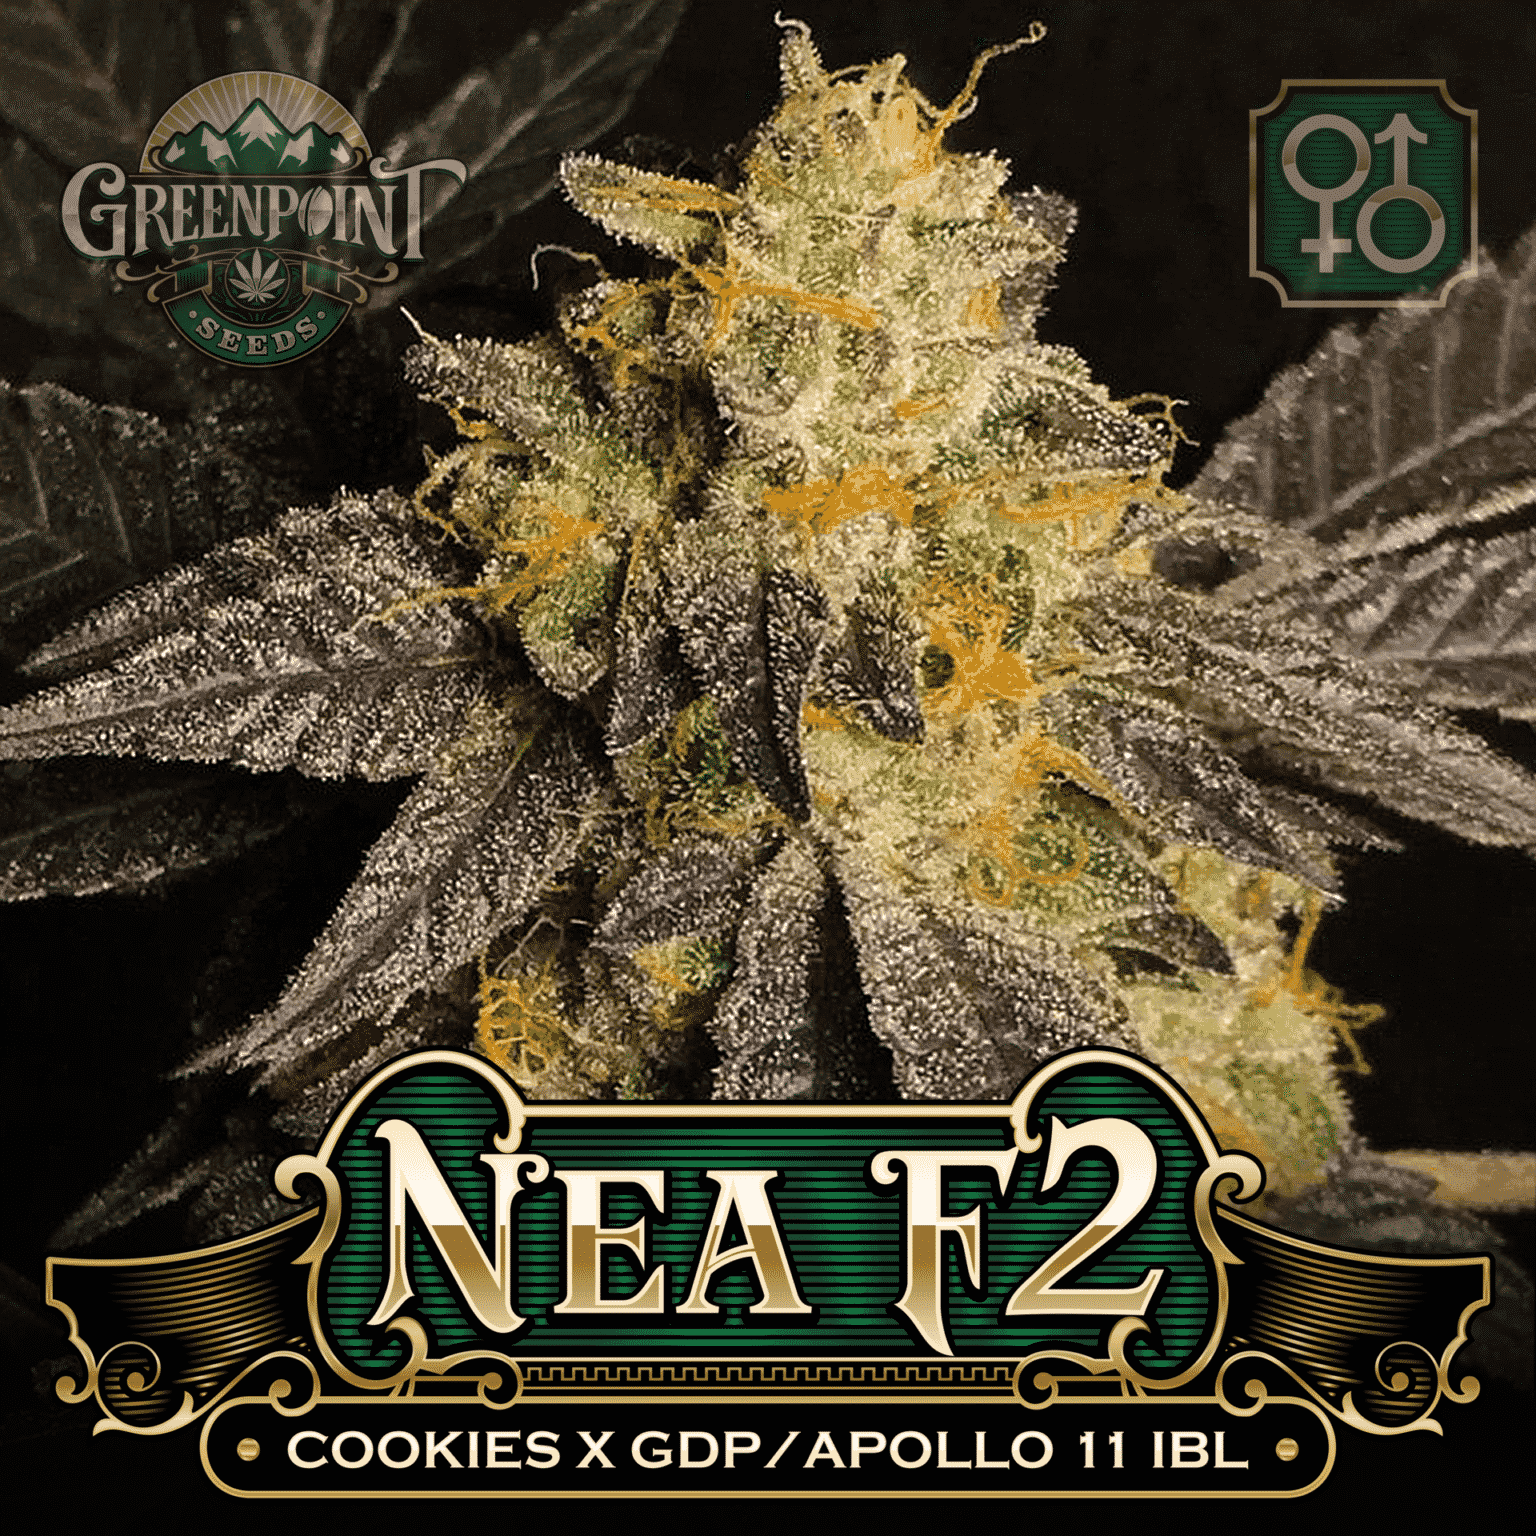 Cookies x (Granddaddy Purple x Apollo 11 IBL) Seeds - Nea F2 Cannabis Seeds